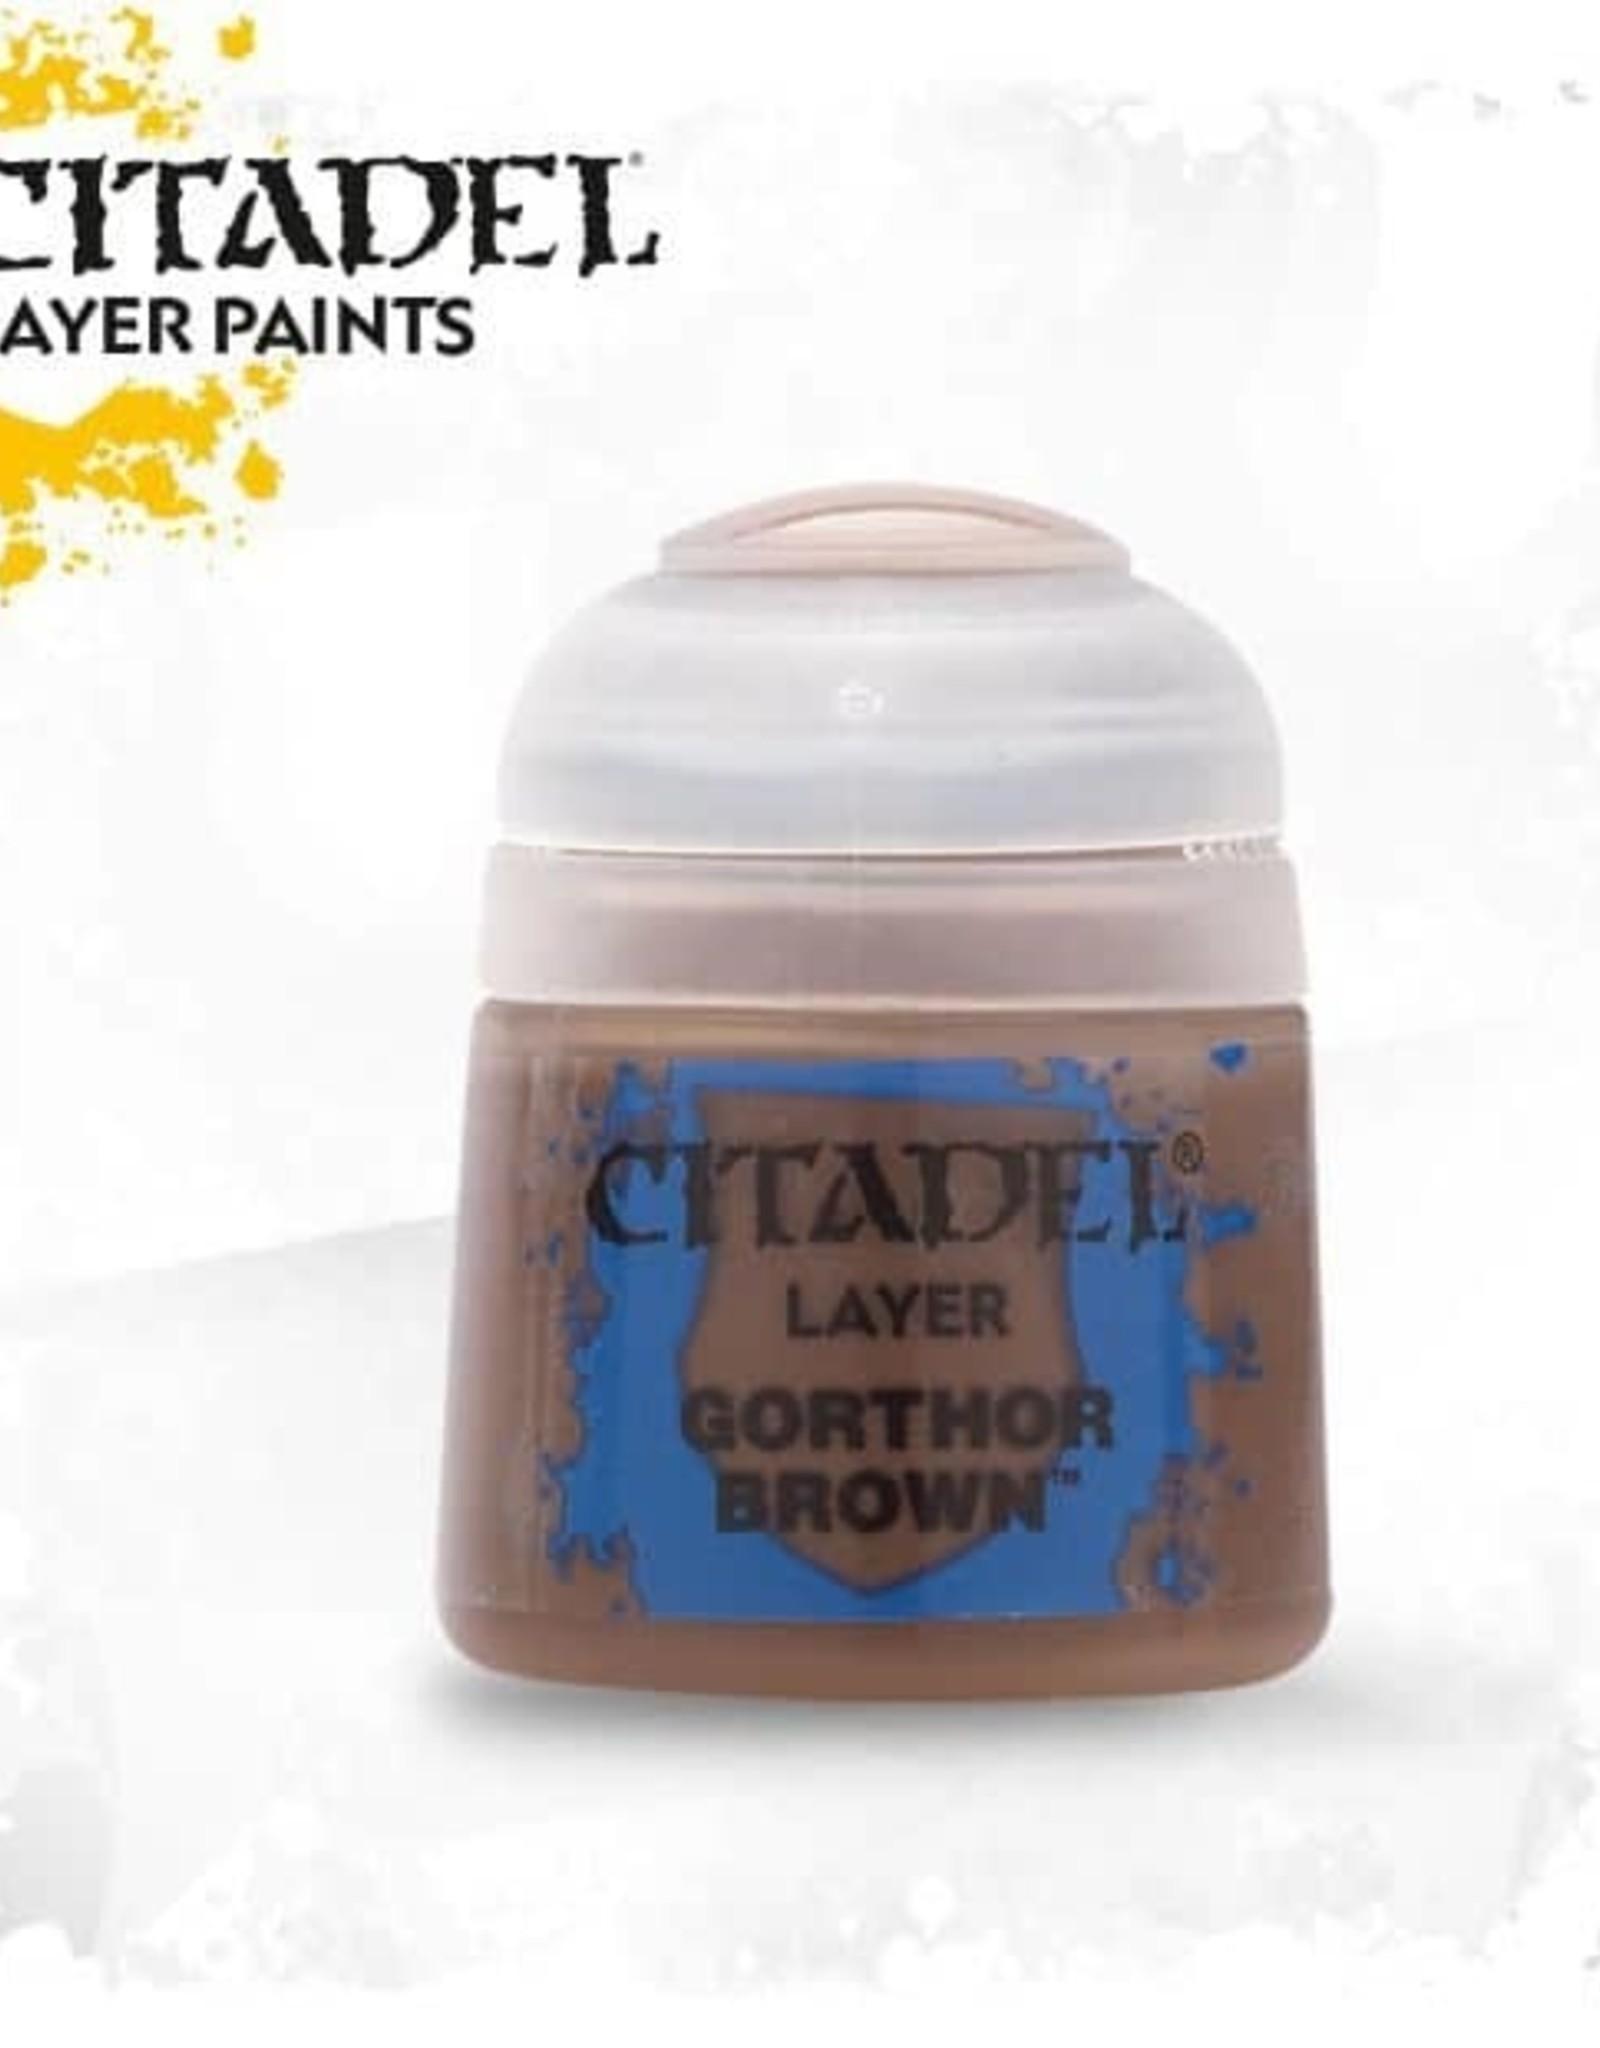 Games Workshop Citadel Paint: Layer - Gorthor Brown